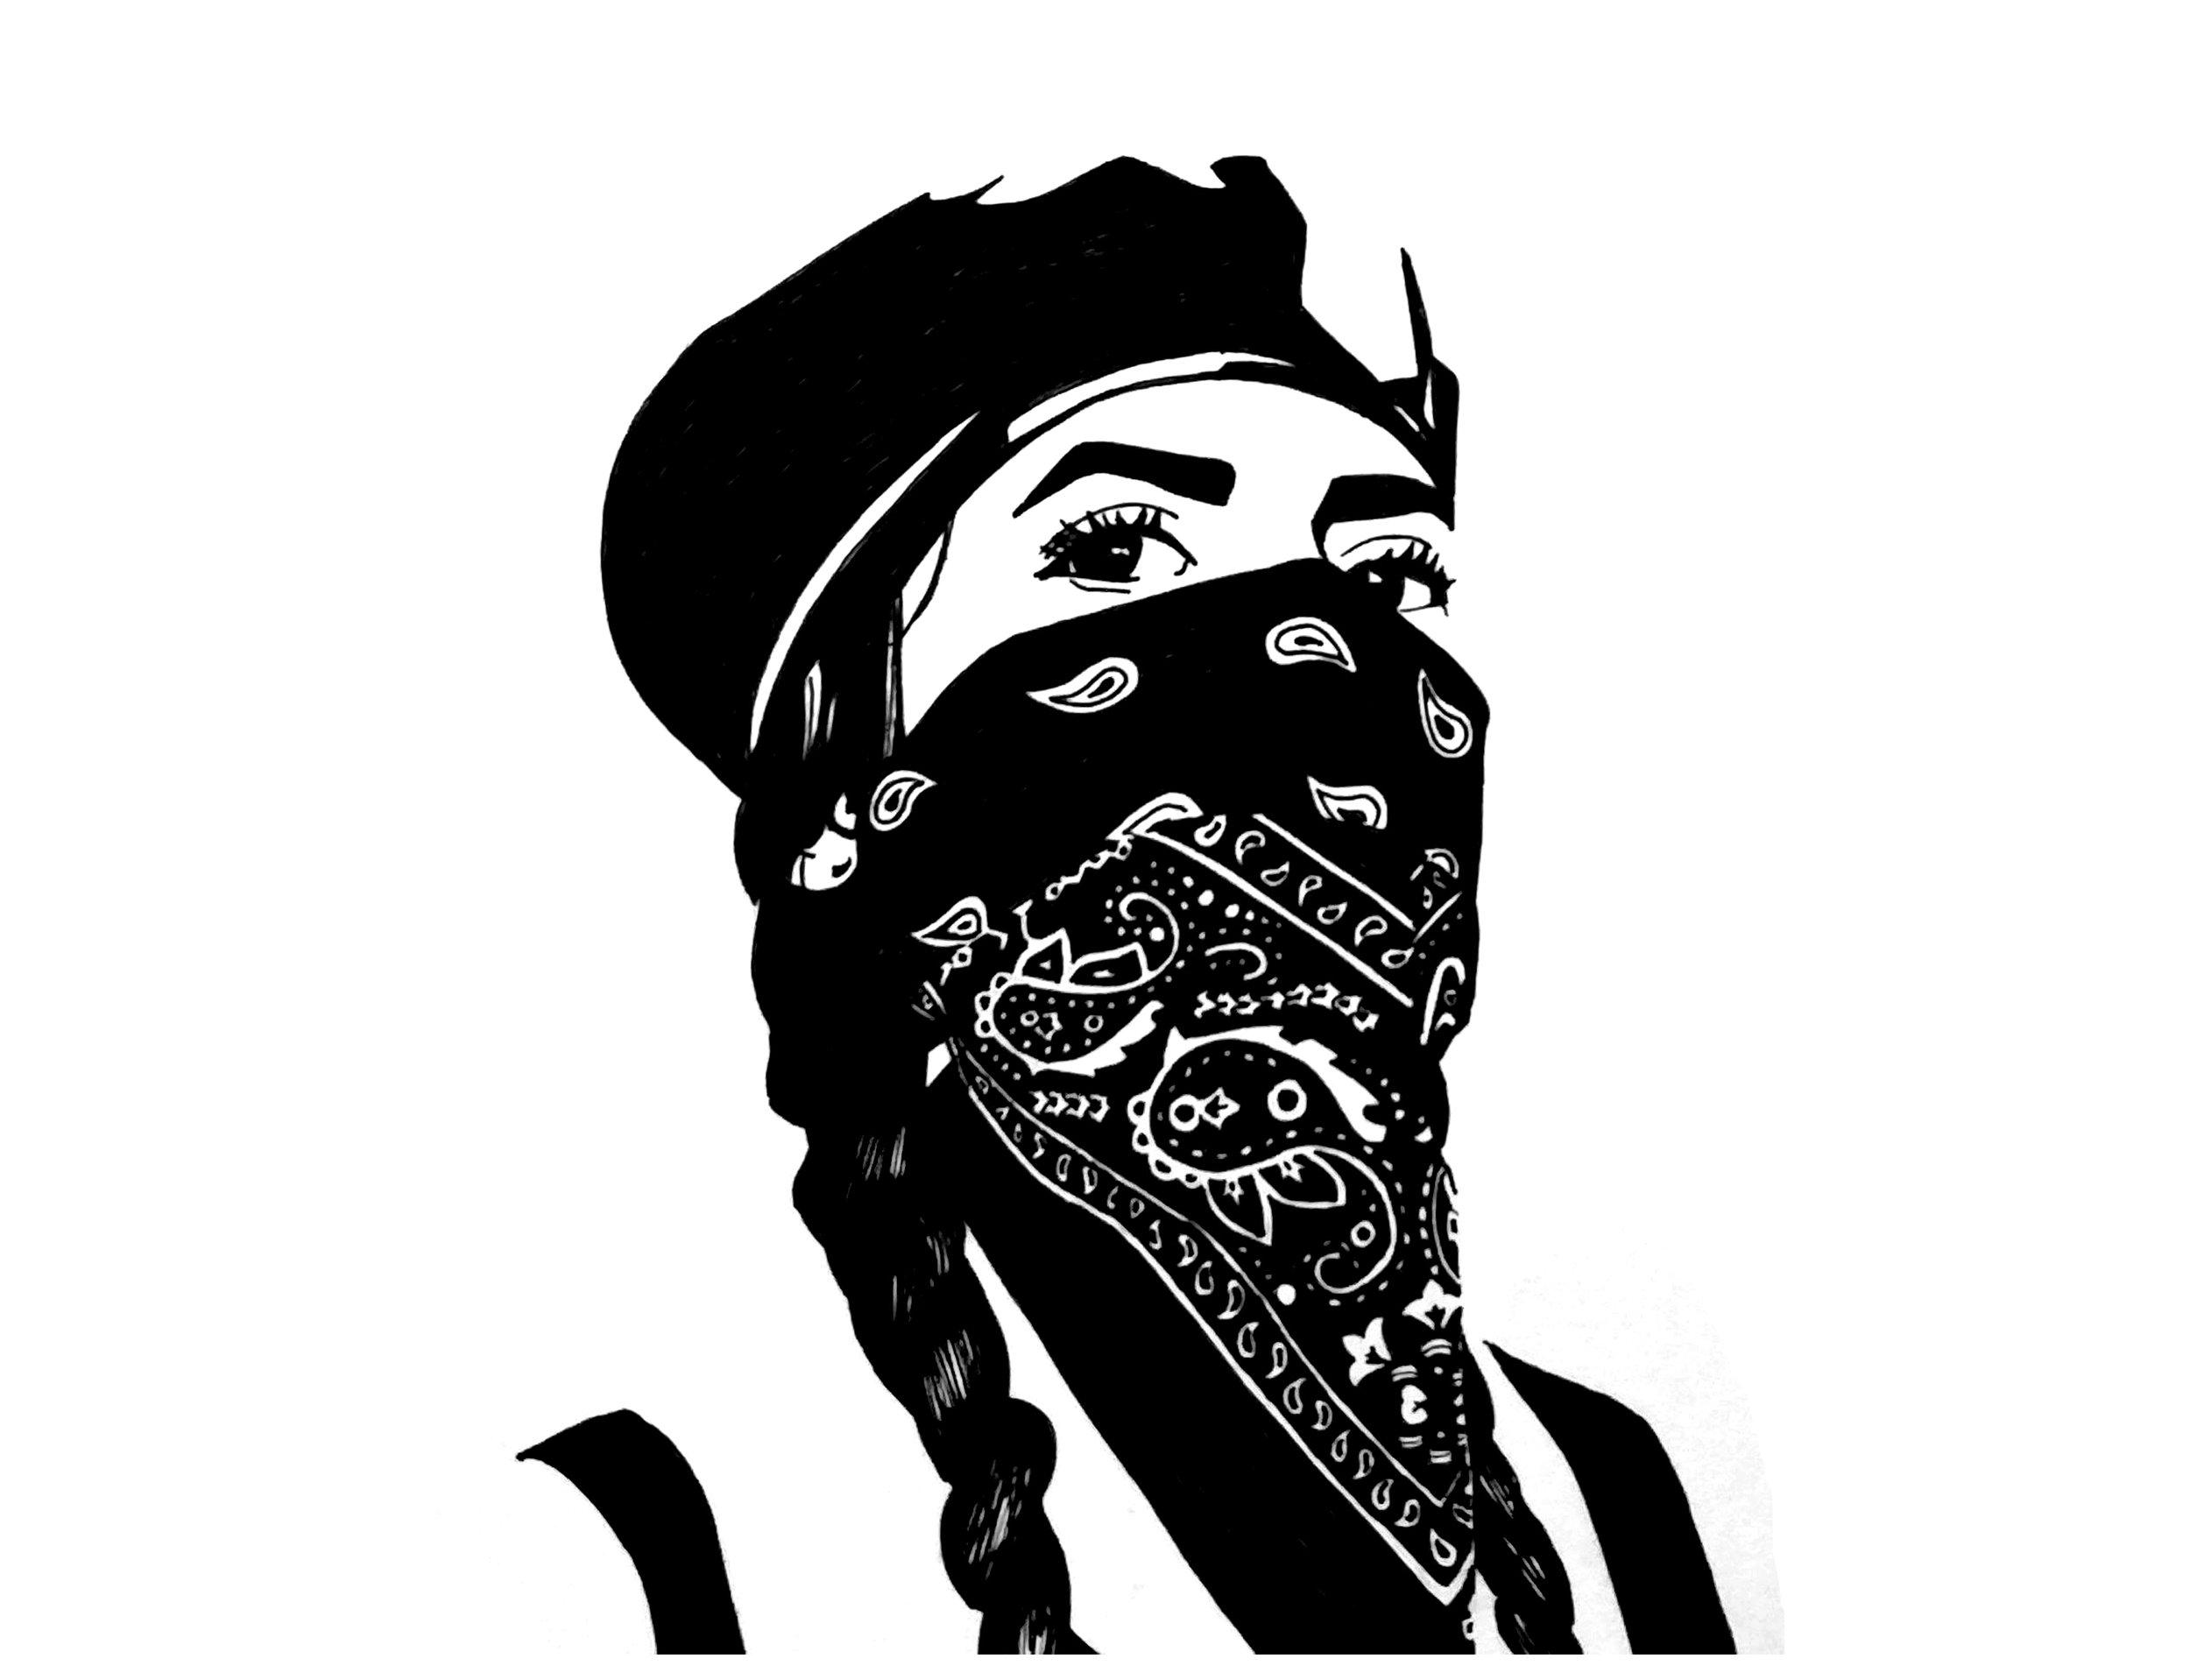 WomensMarch-Image.jpg